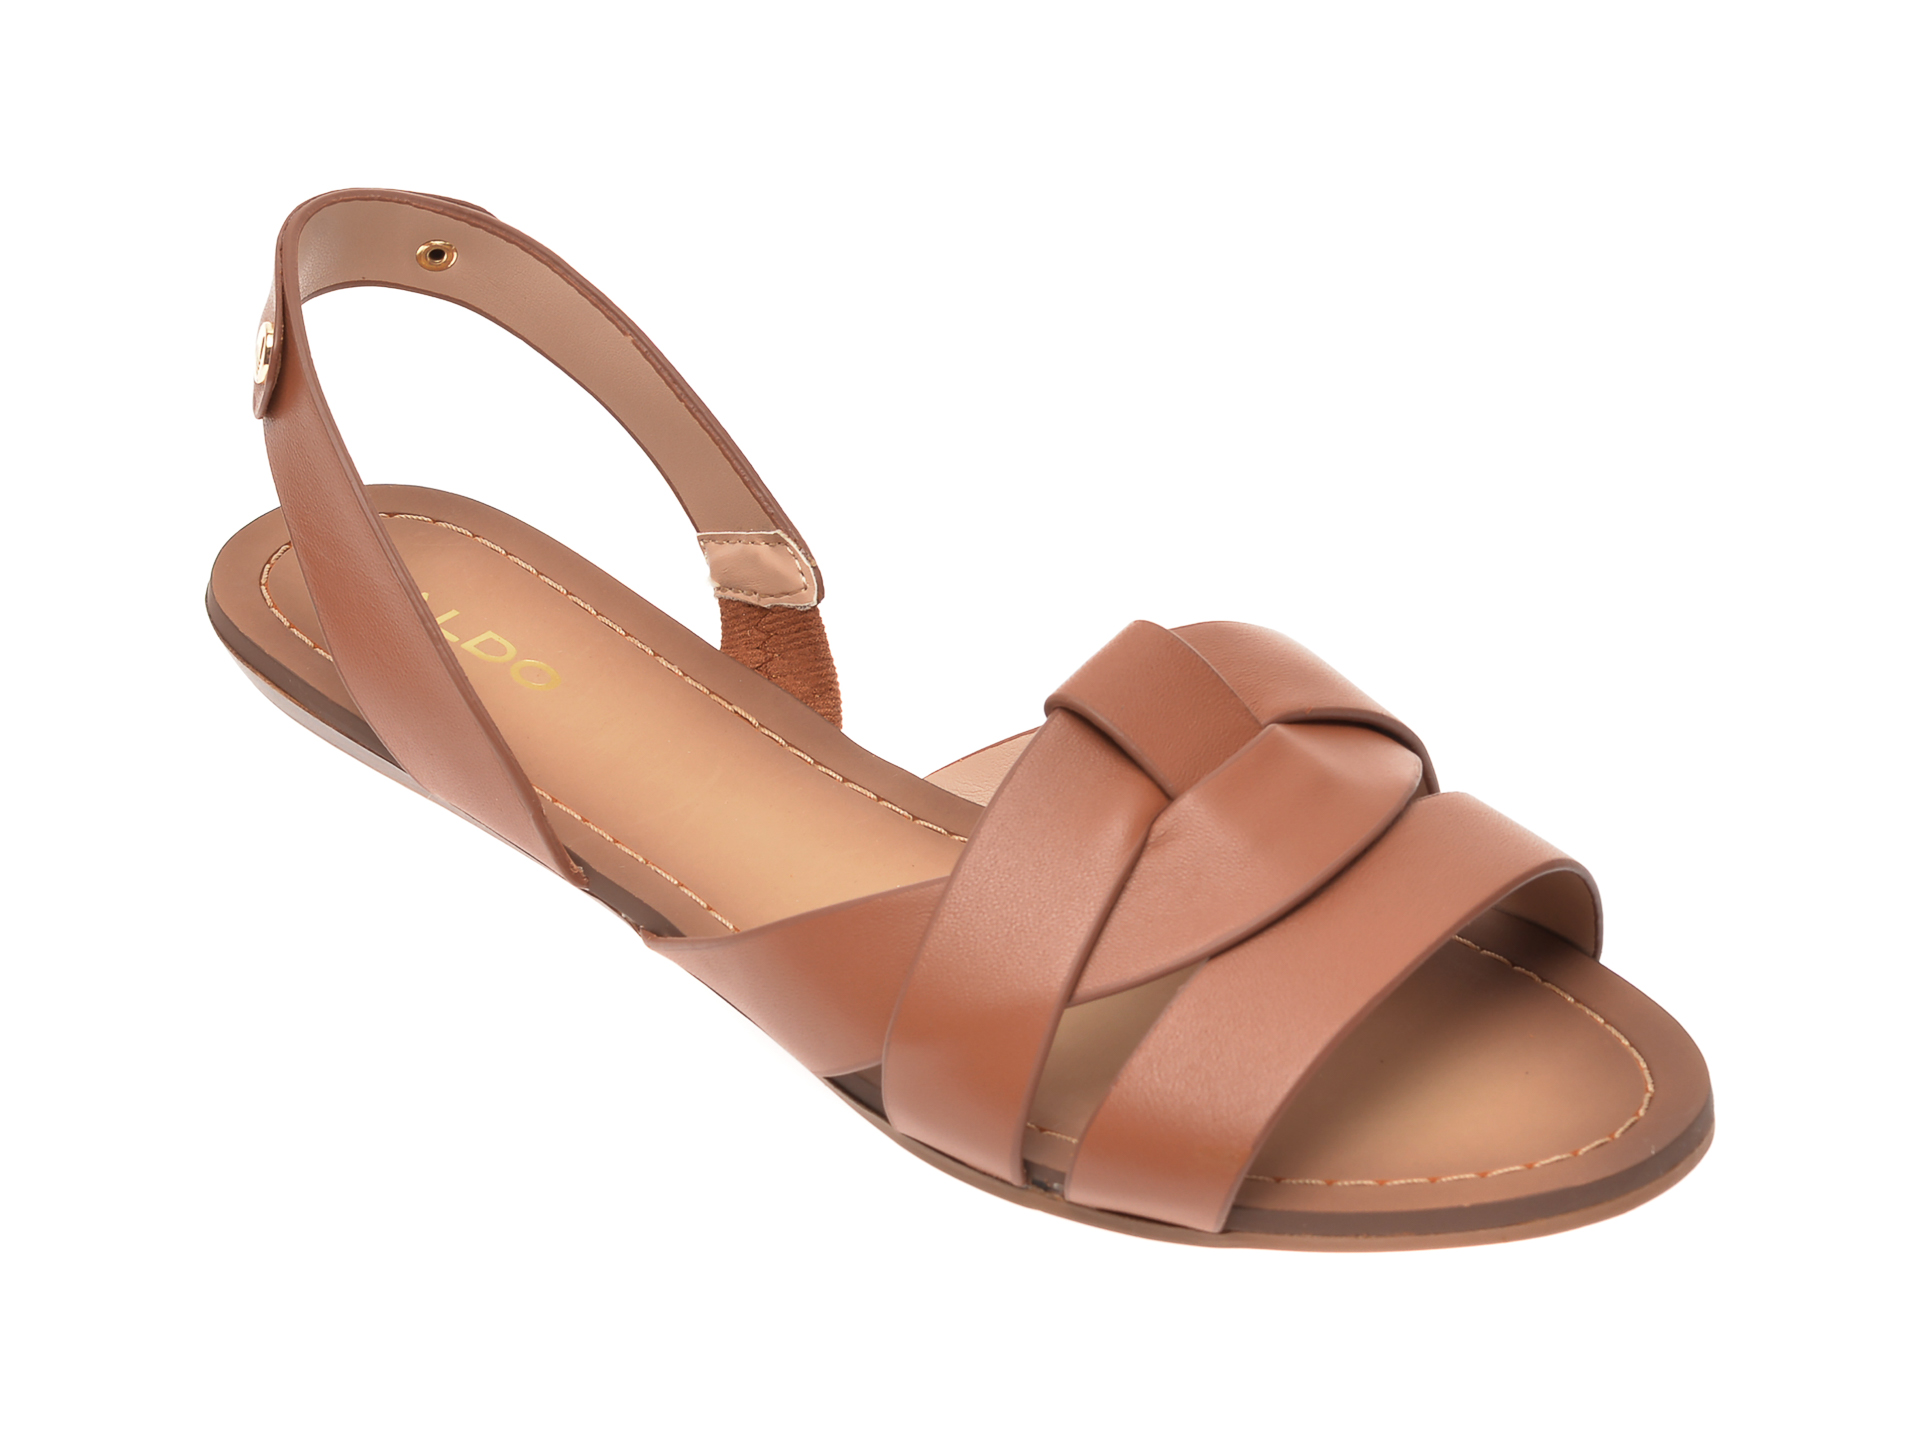 Sandale ALDO maro, Deladriewiel220, din piele naturala